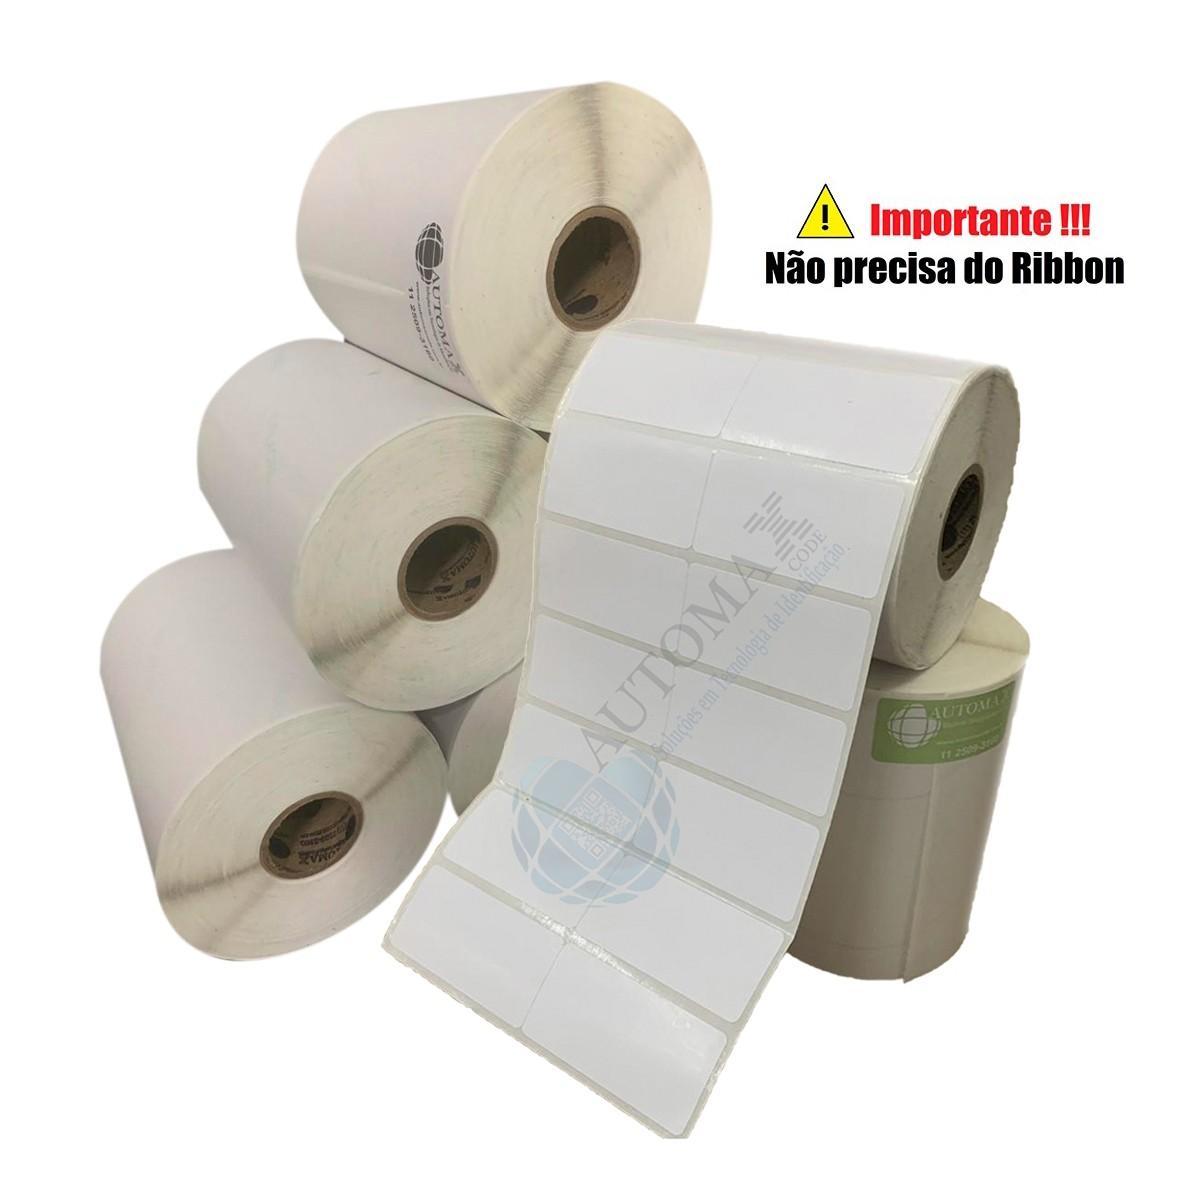 10 Rolos de Etiqueta Térmica 50x25 | 50mmX25mm 2 Colunas